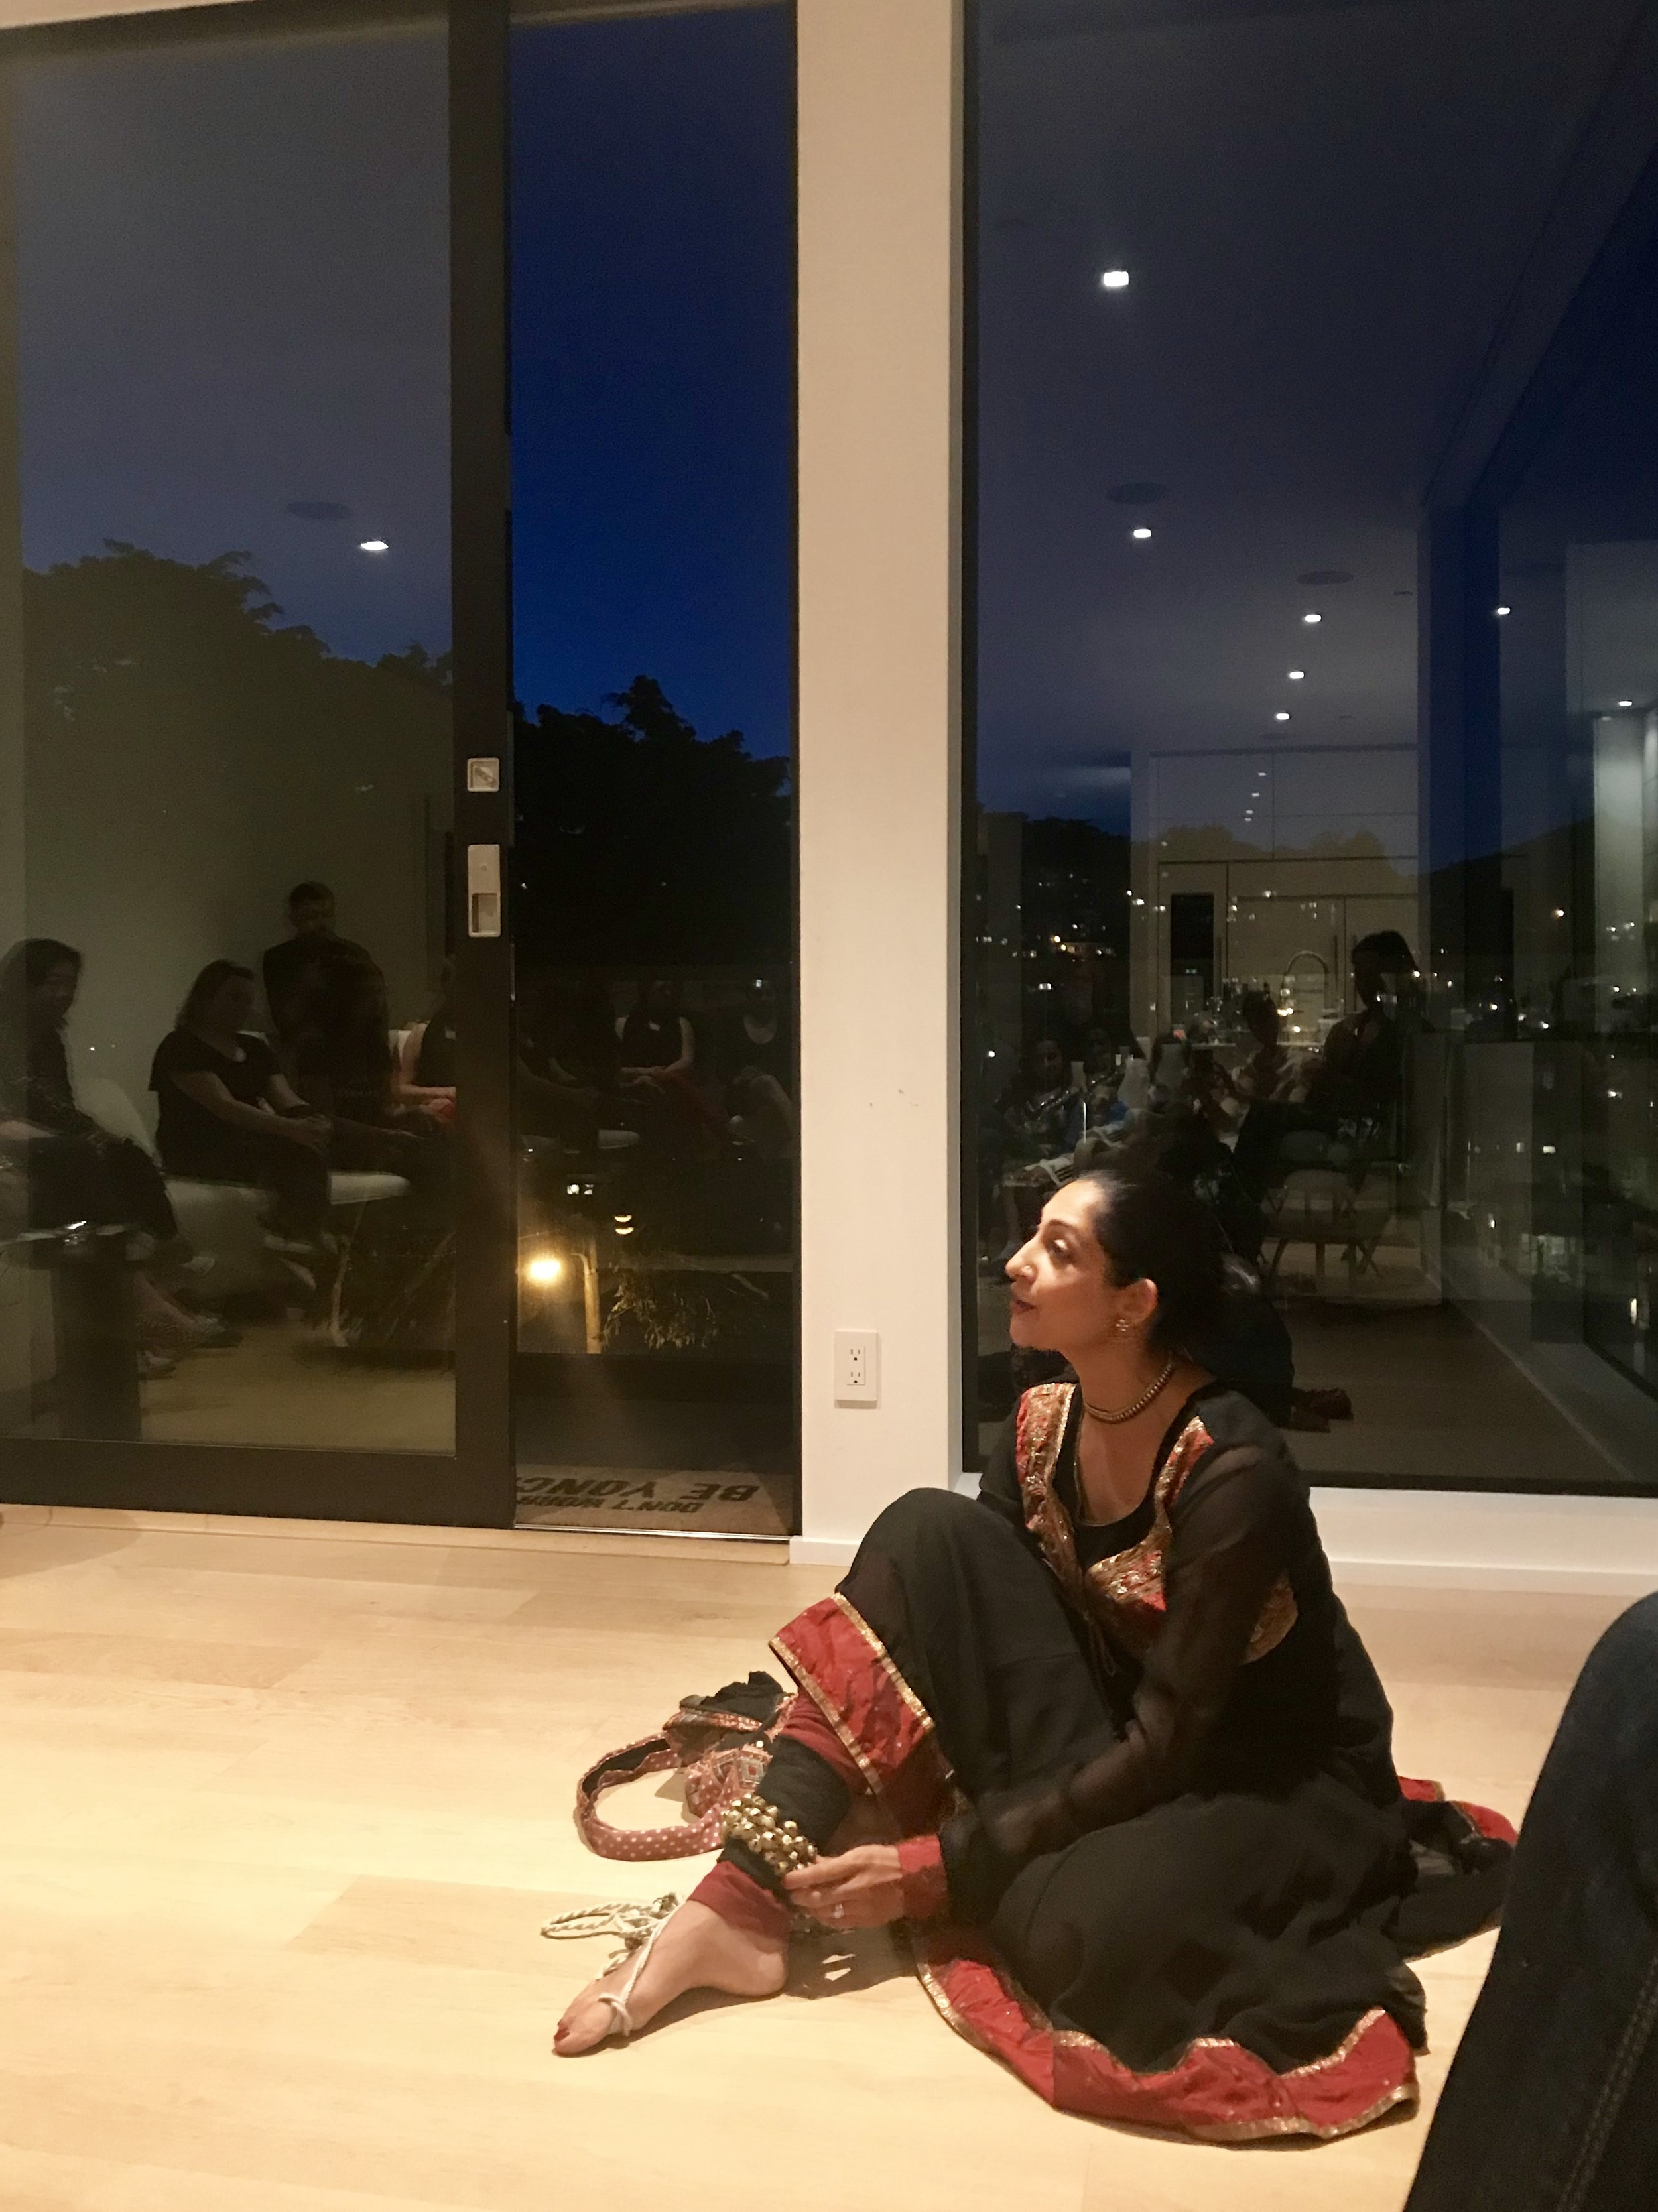 Farah Yasmeen Shaikh. Inside Out. San Francisco, CA. 9.20.2018. videos by Ajoy Advani.